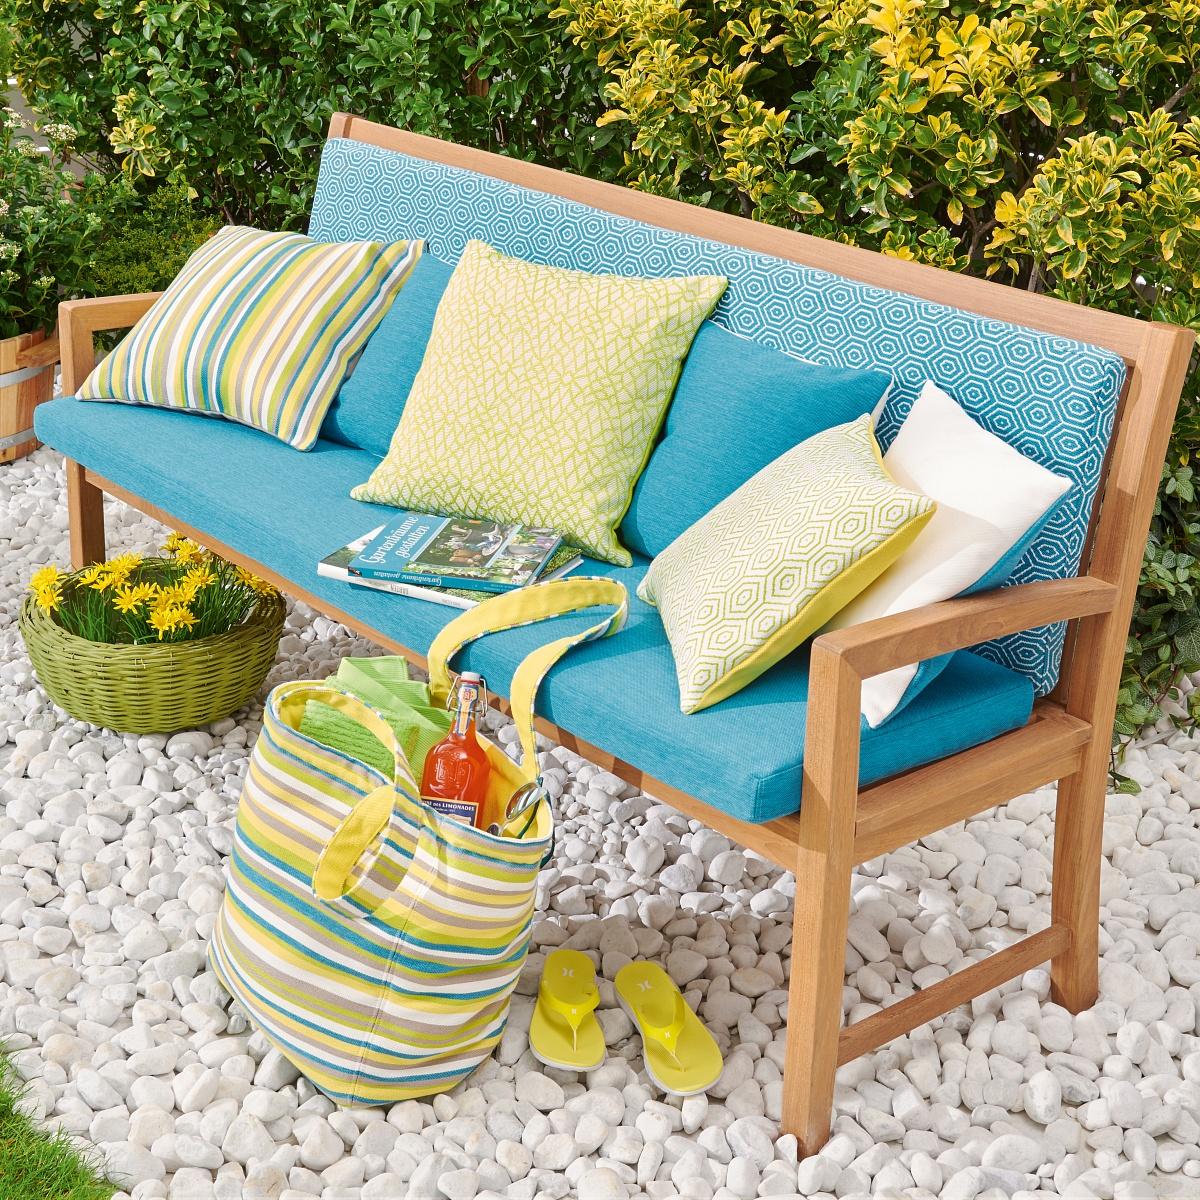 saum viebahn in outdoor 2016 mantis cz. Black Bedroom Furniture Sets. Home Design Ideas